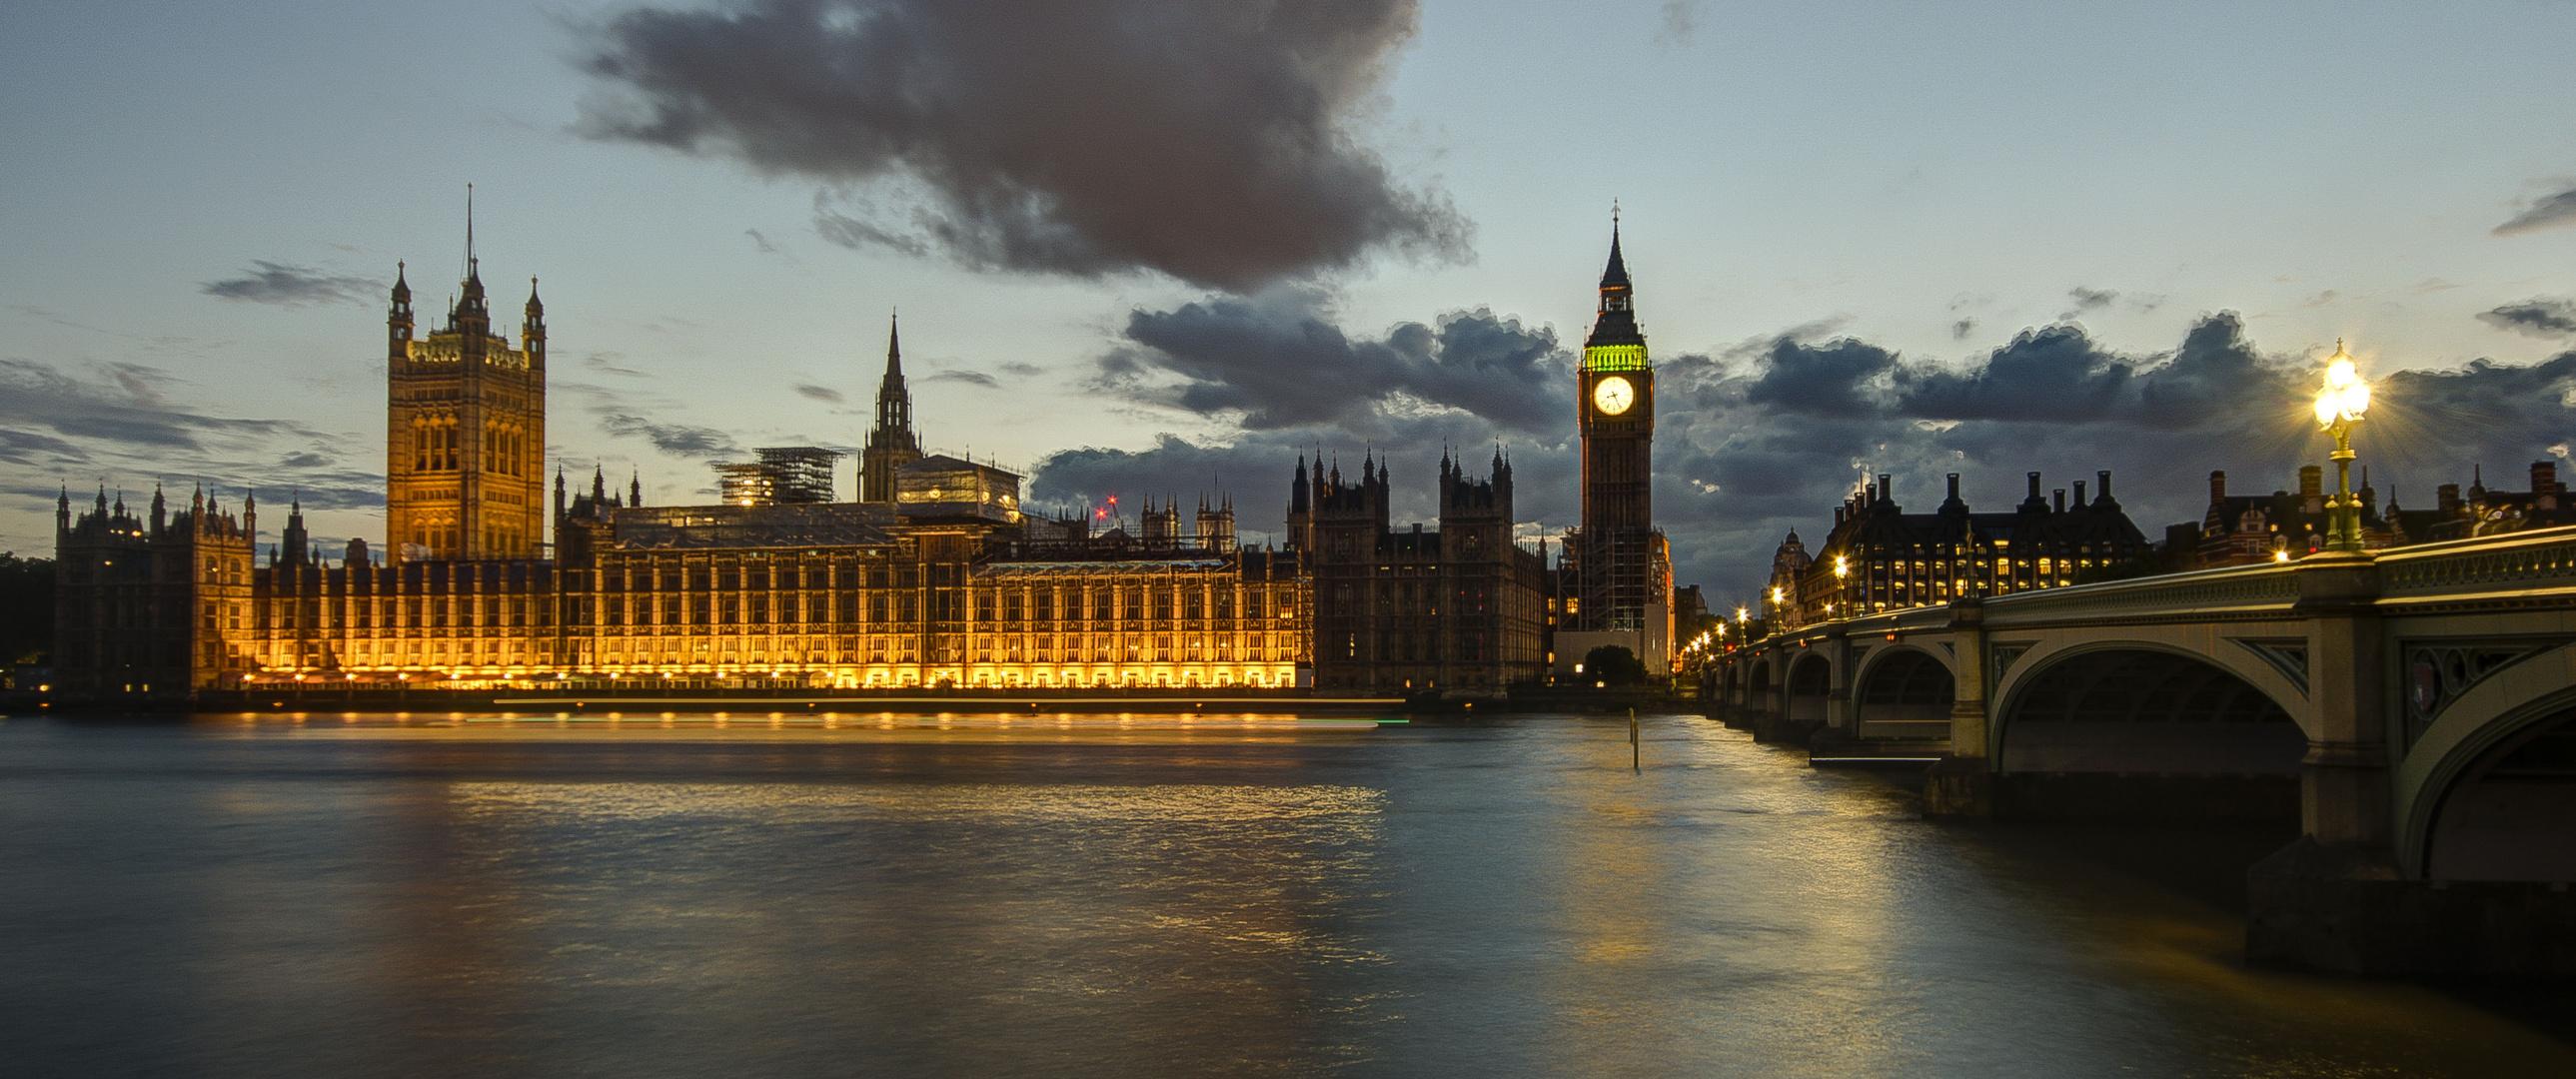 London - Houses of Parliament & Westminster Bridge - 07